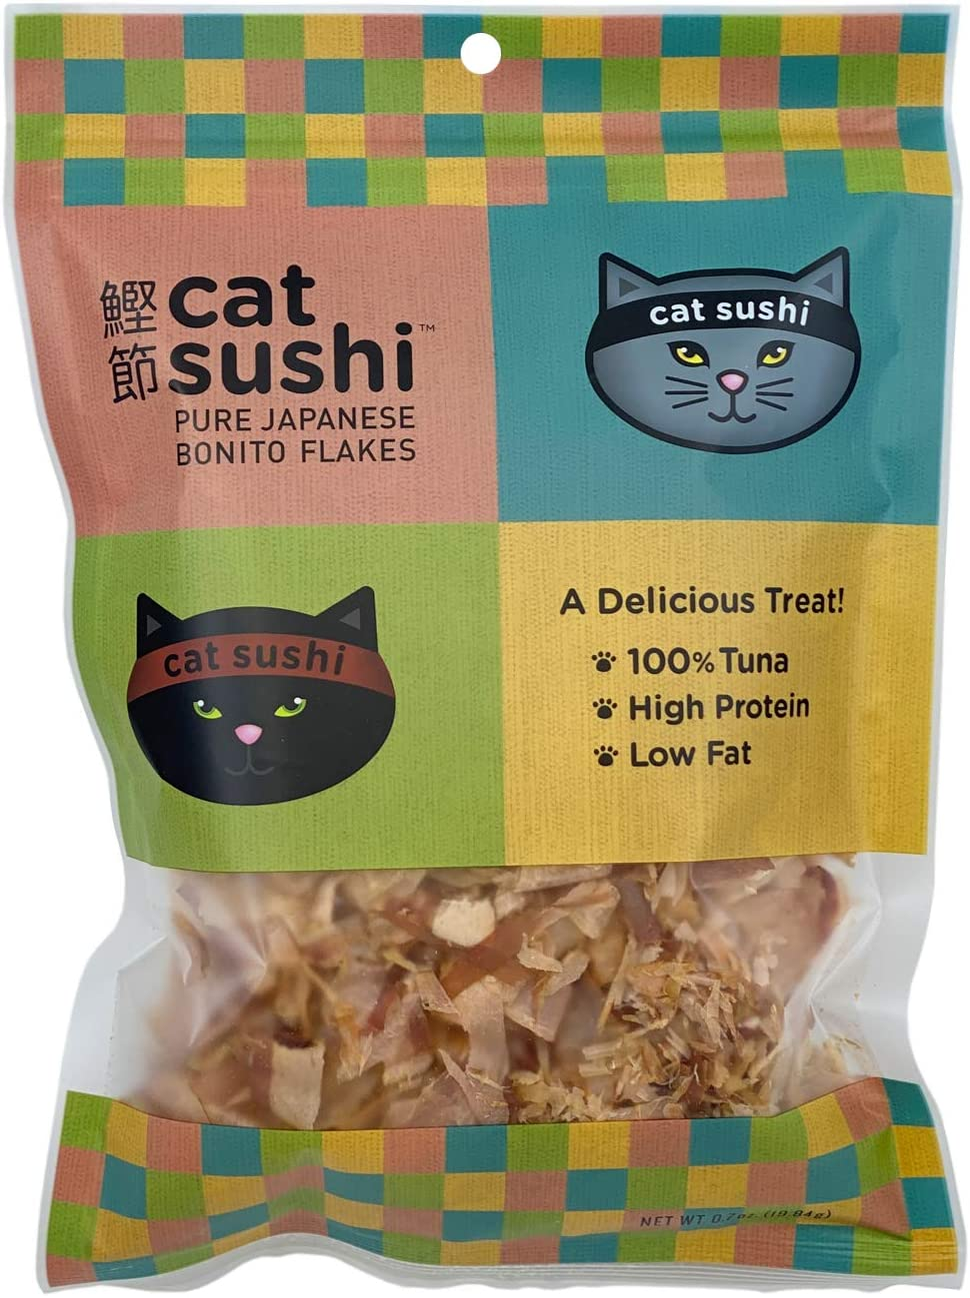 Cat Sushi Bonito Flakes